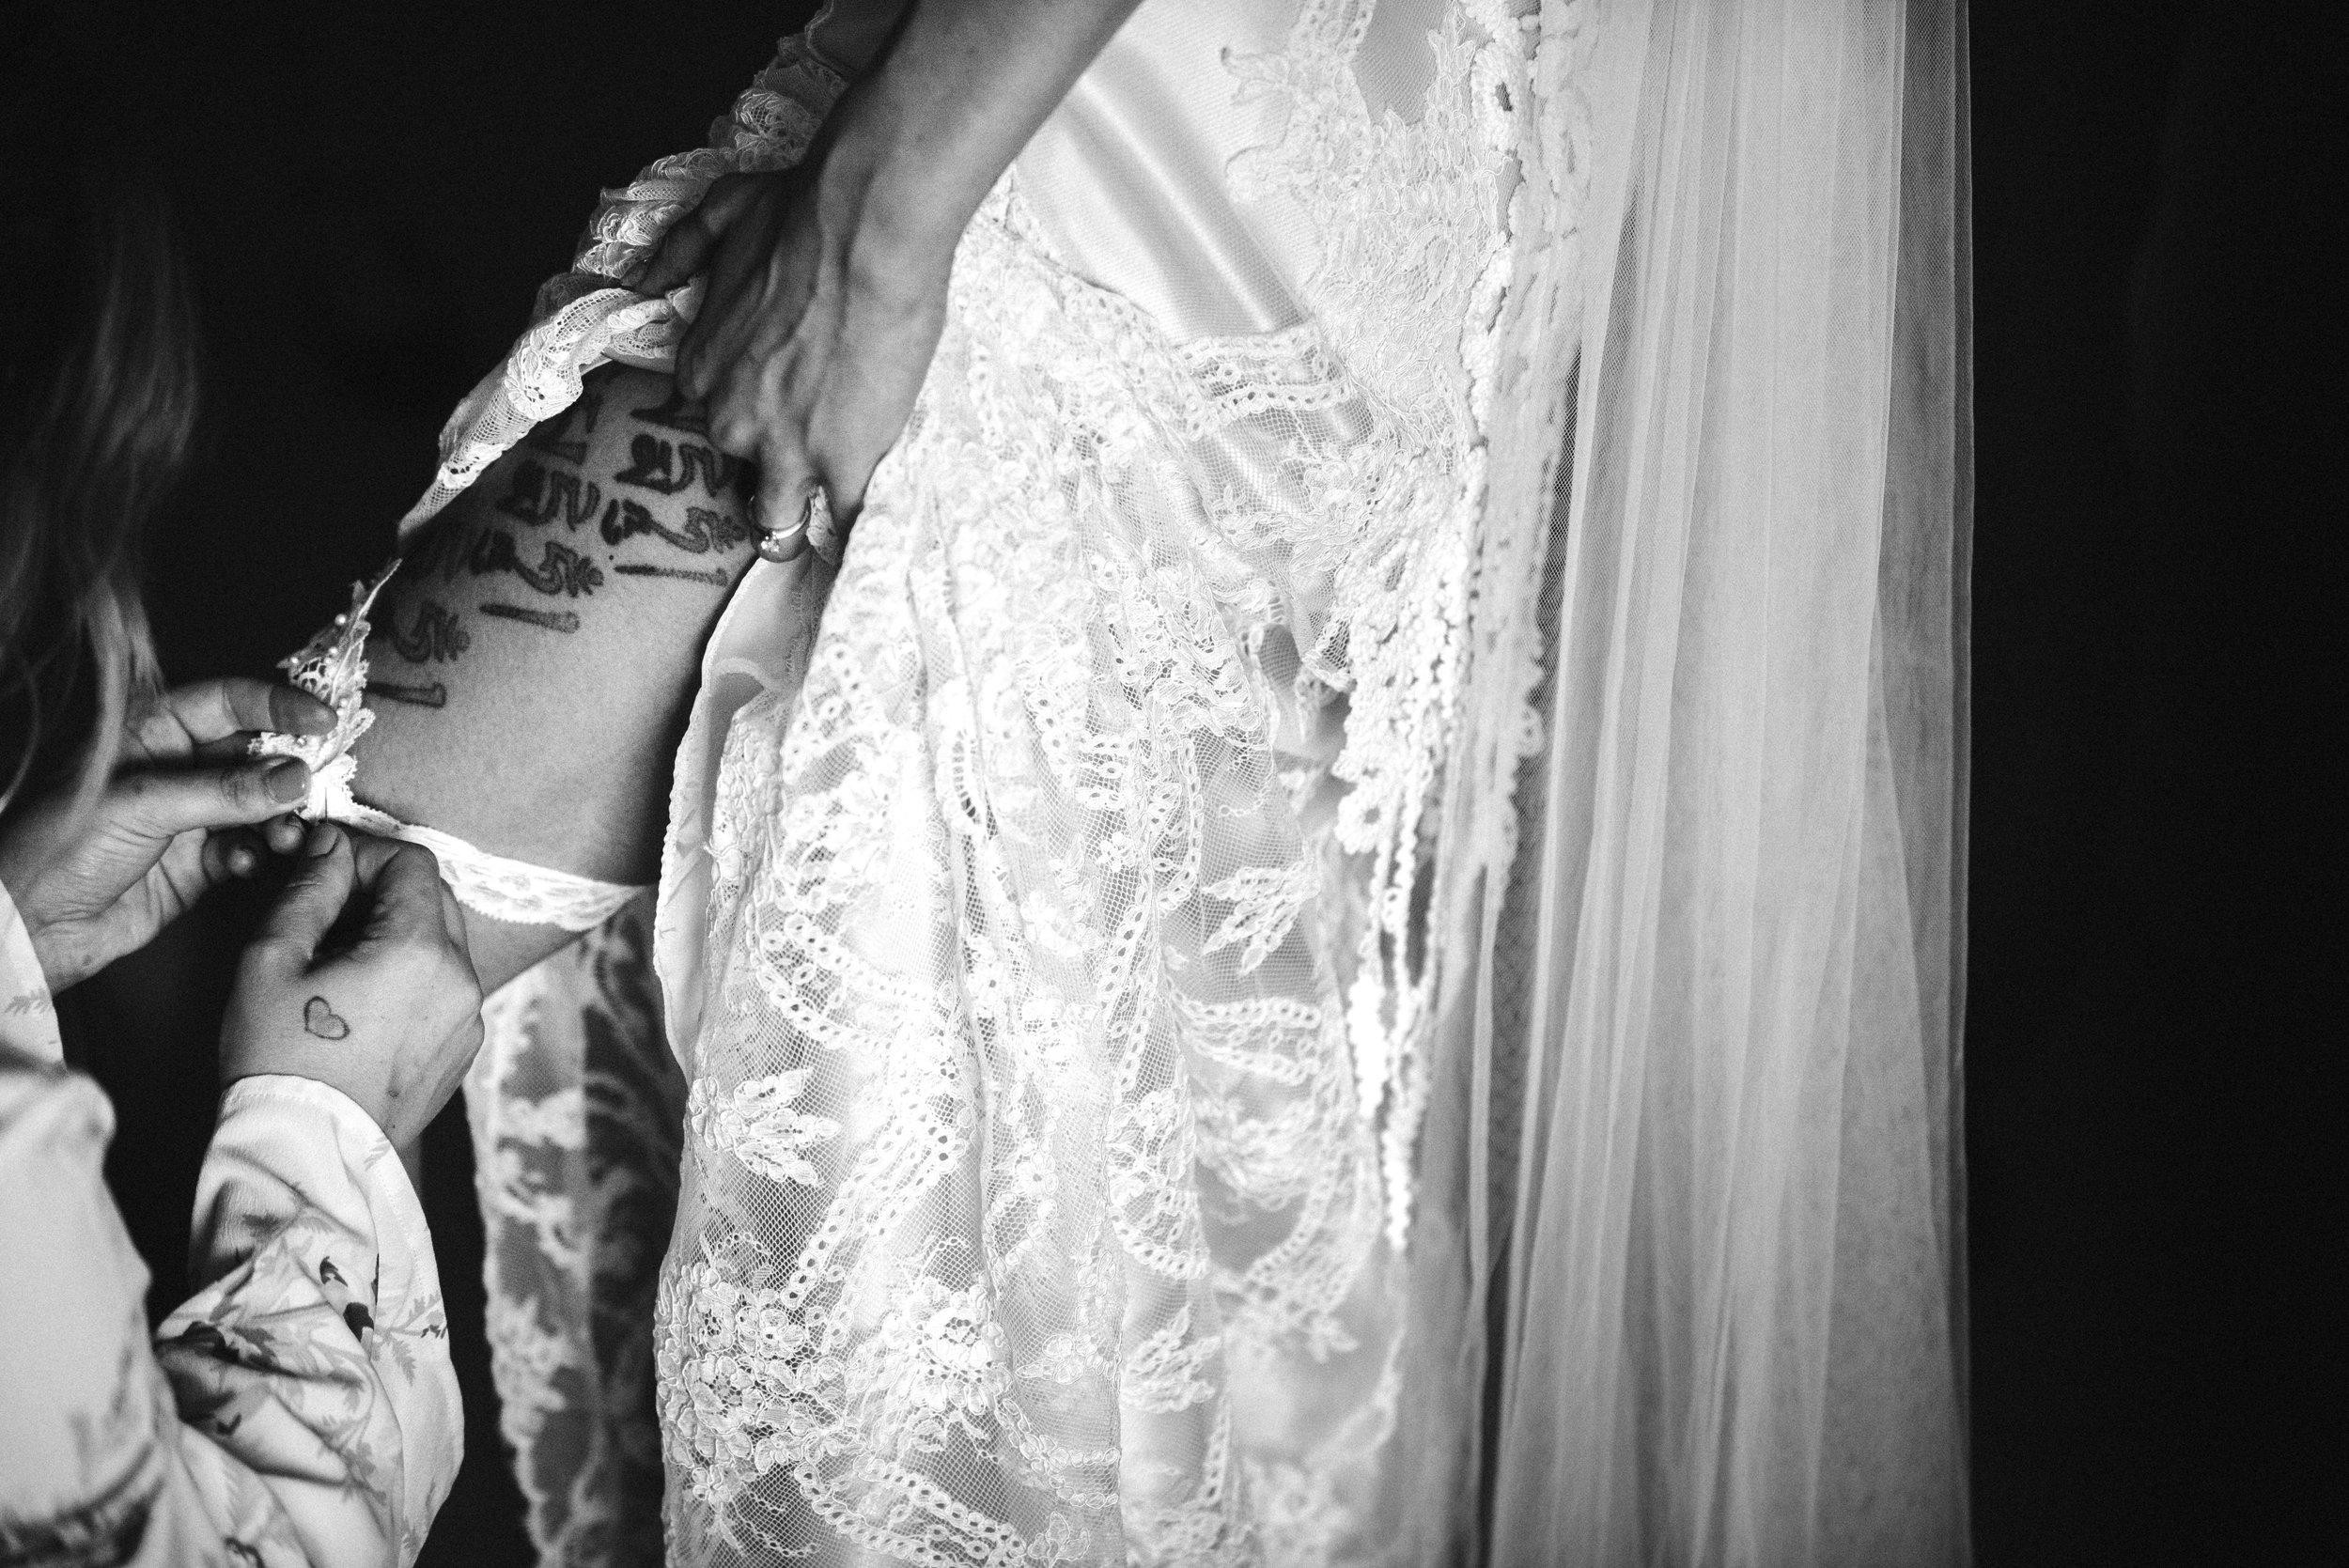 pengenna-manor-wedding-photographer-25.jpg